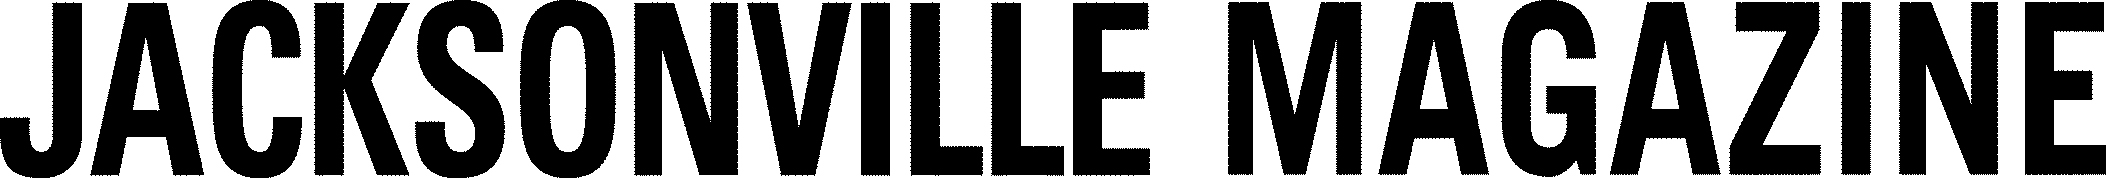 jaxmag logo long.jpg